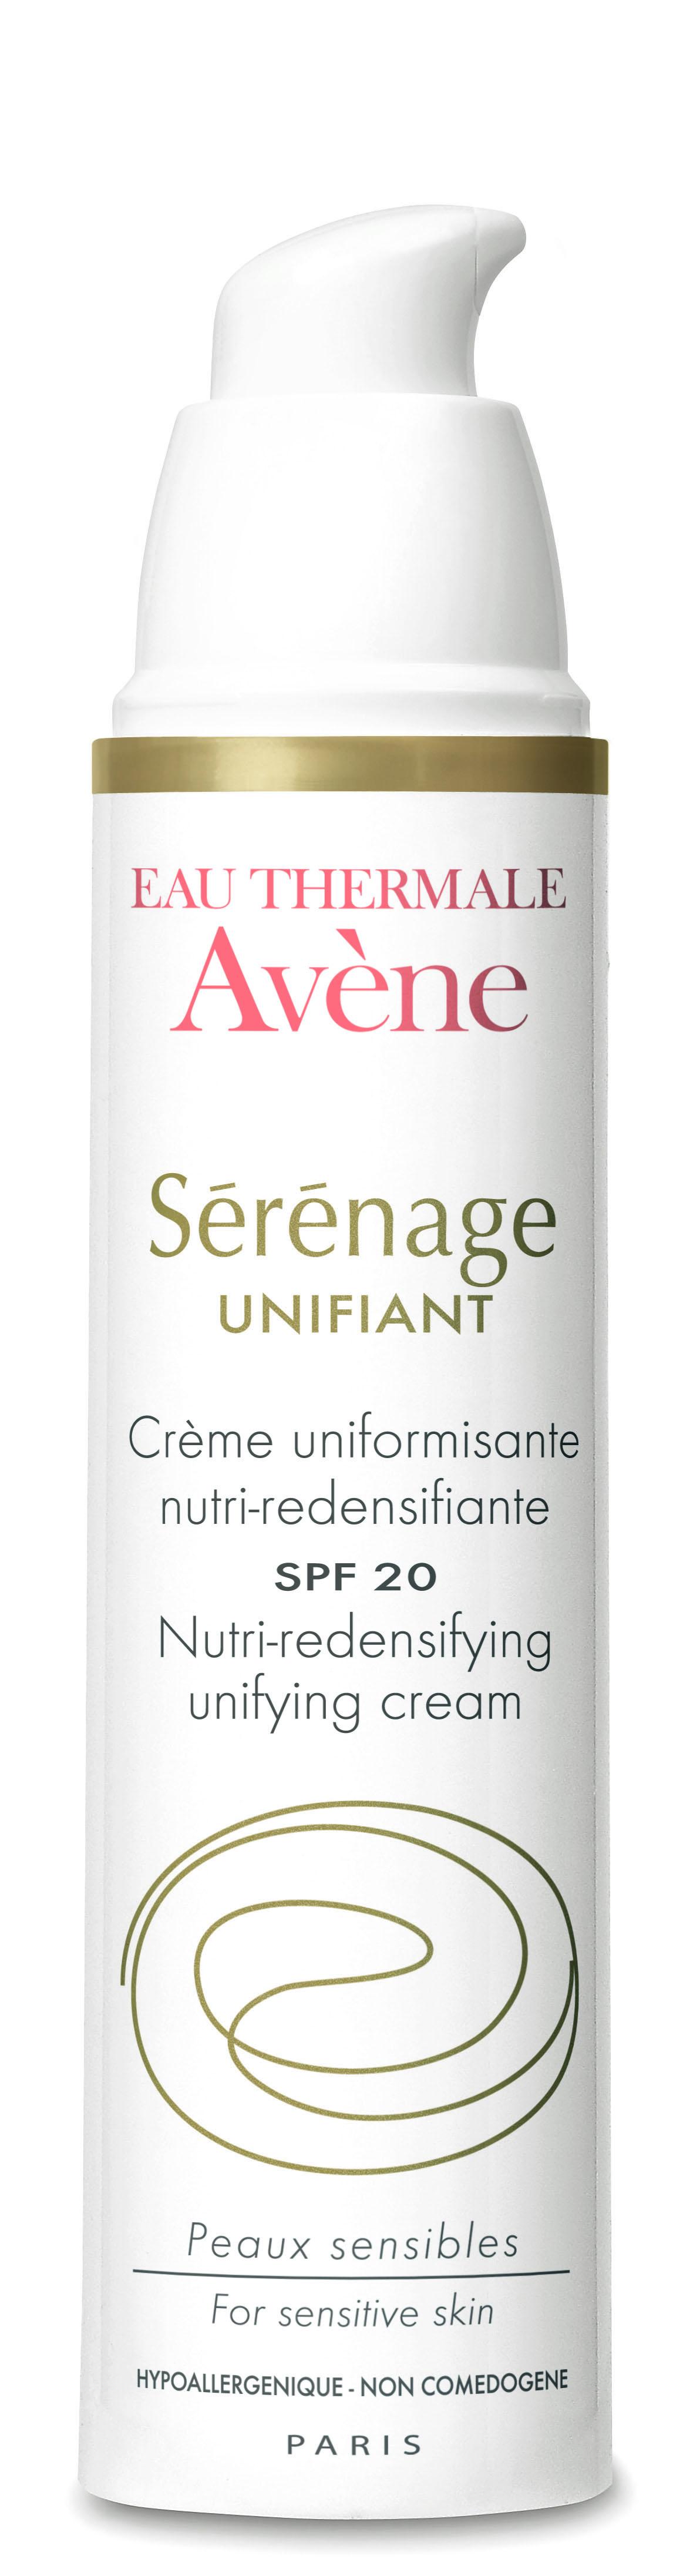 Image SERENAGE UNIFIANT crème uniformisante nutri-redensifiante